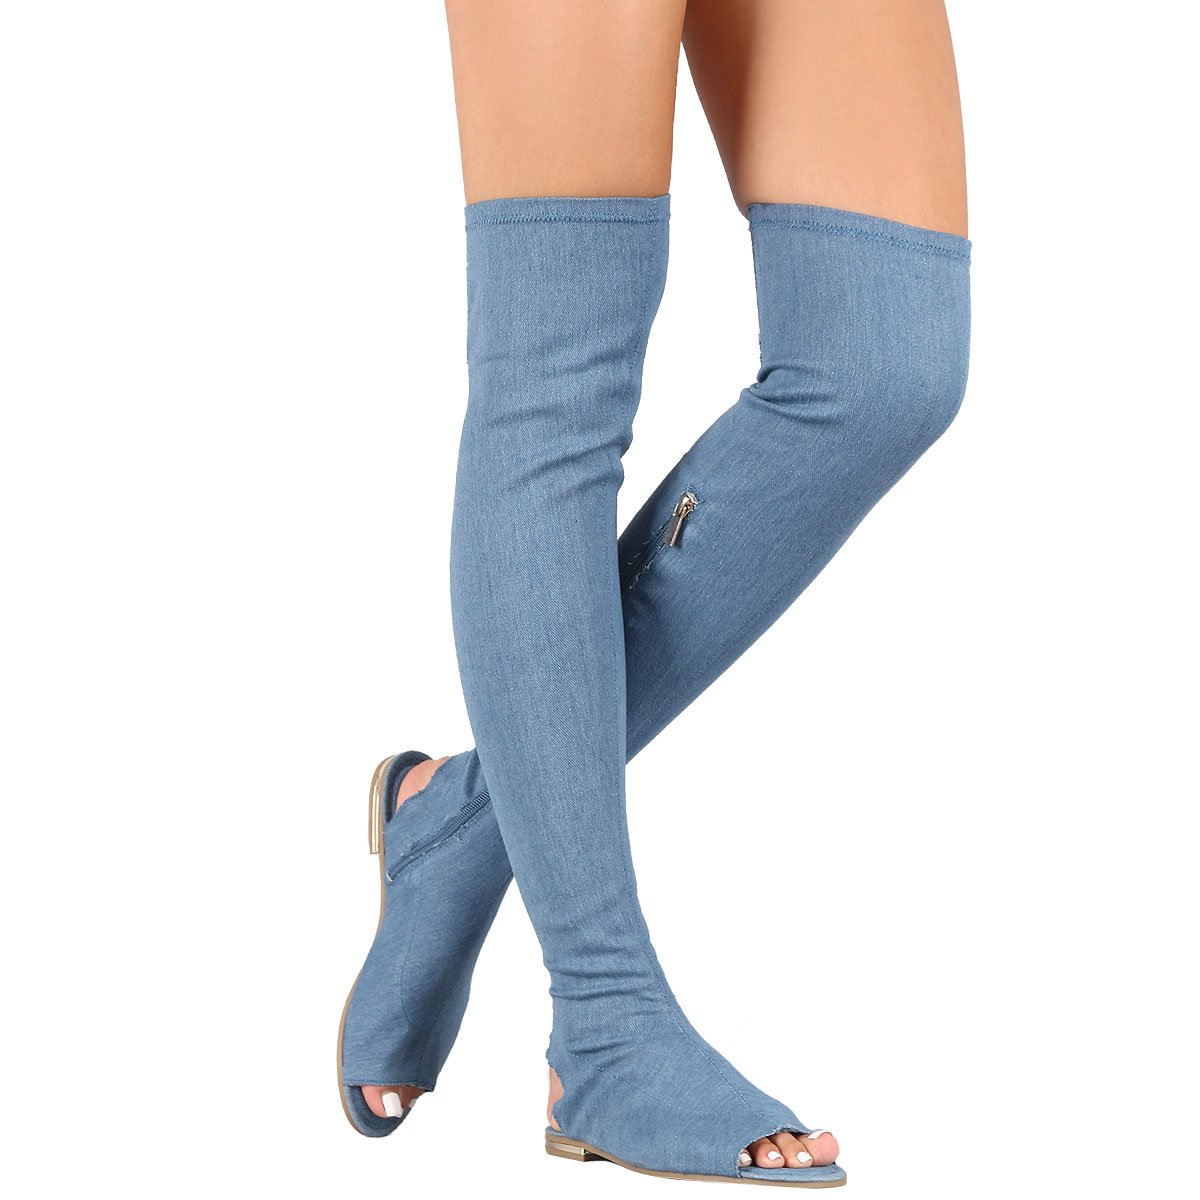 Bamboo Womens Pee Toe Silhouette Stretch Over The Knee Thigh High Side Zipper Flat Sandal Boot 8 Denim